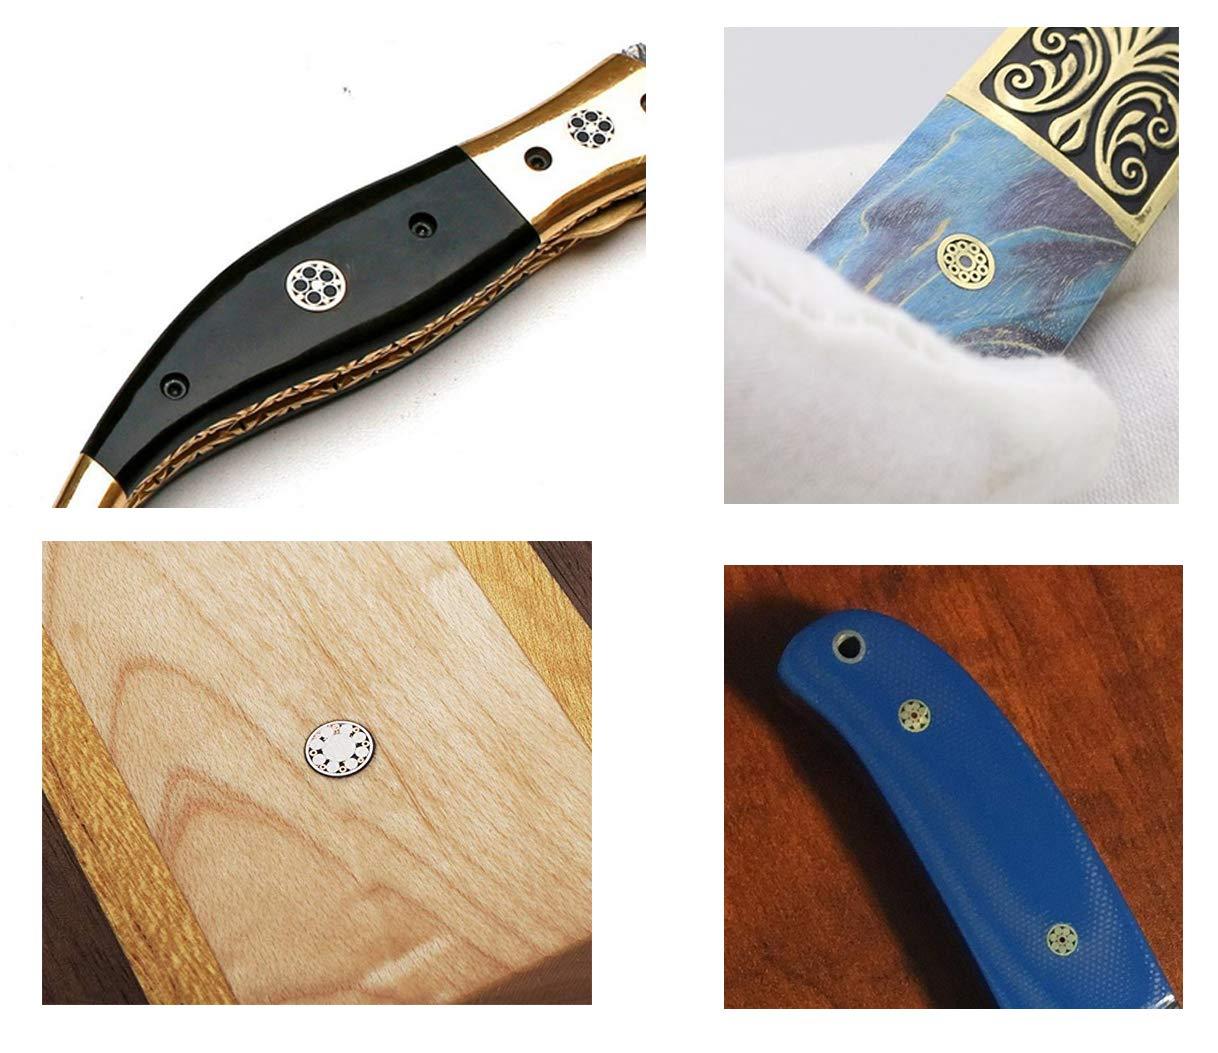 Cuchillo Cuchillas de mosaico Cuchillo Mango Cuchillos ...